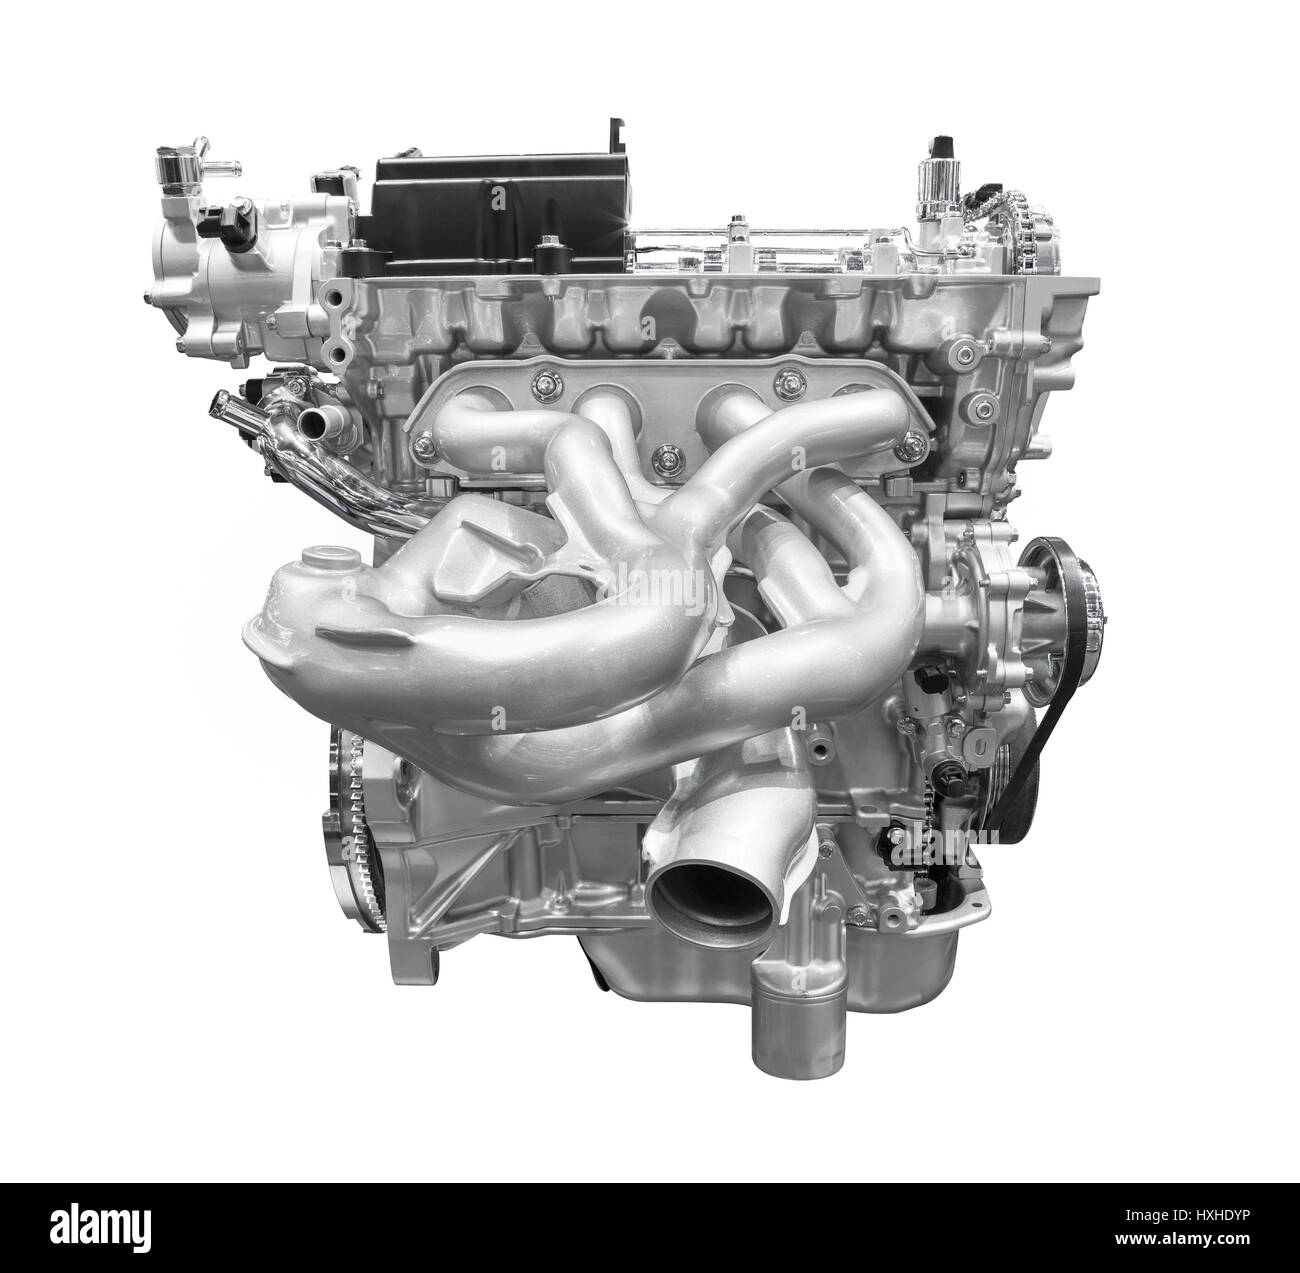 Turbo Parts Stockfotos & Turbo Parts Bilder - Seite 3 - Alamy